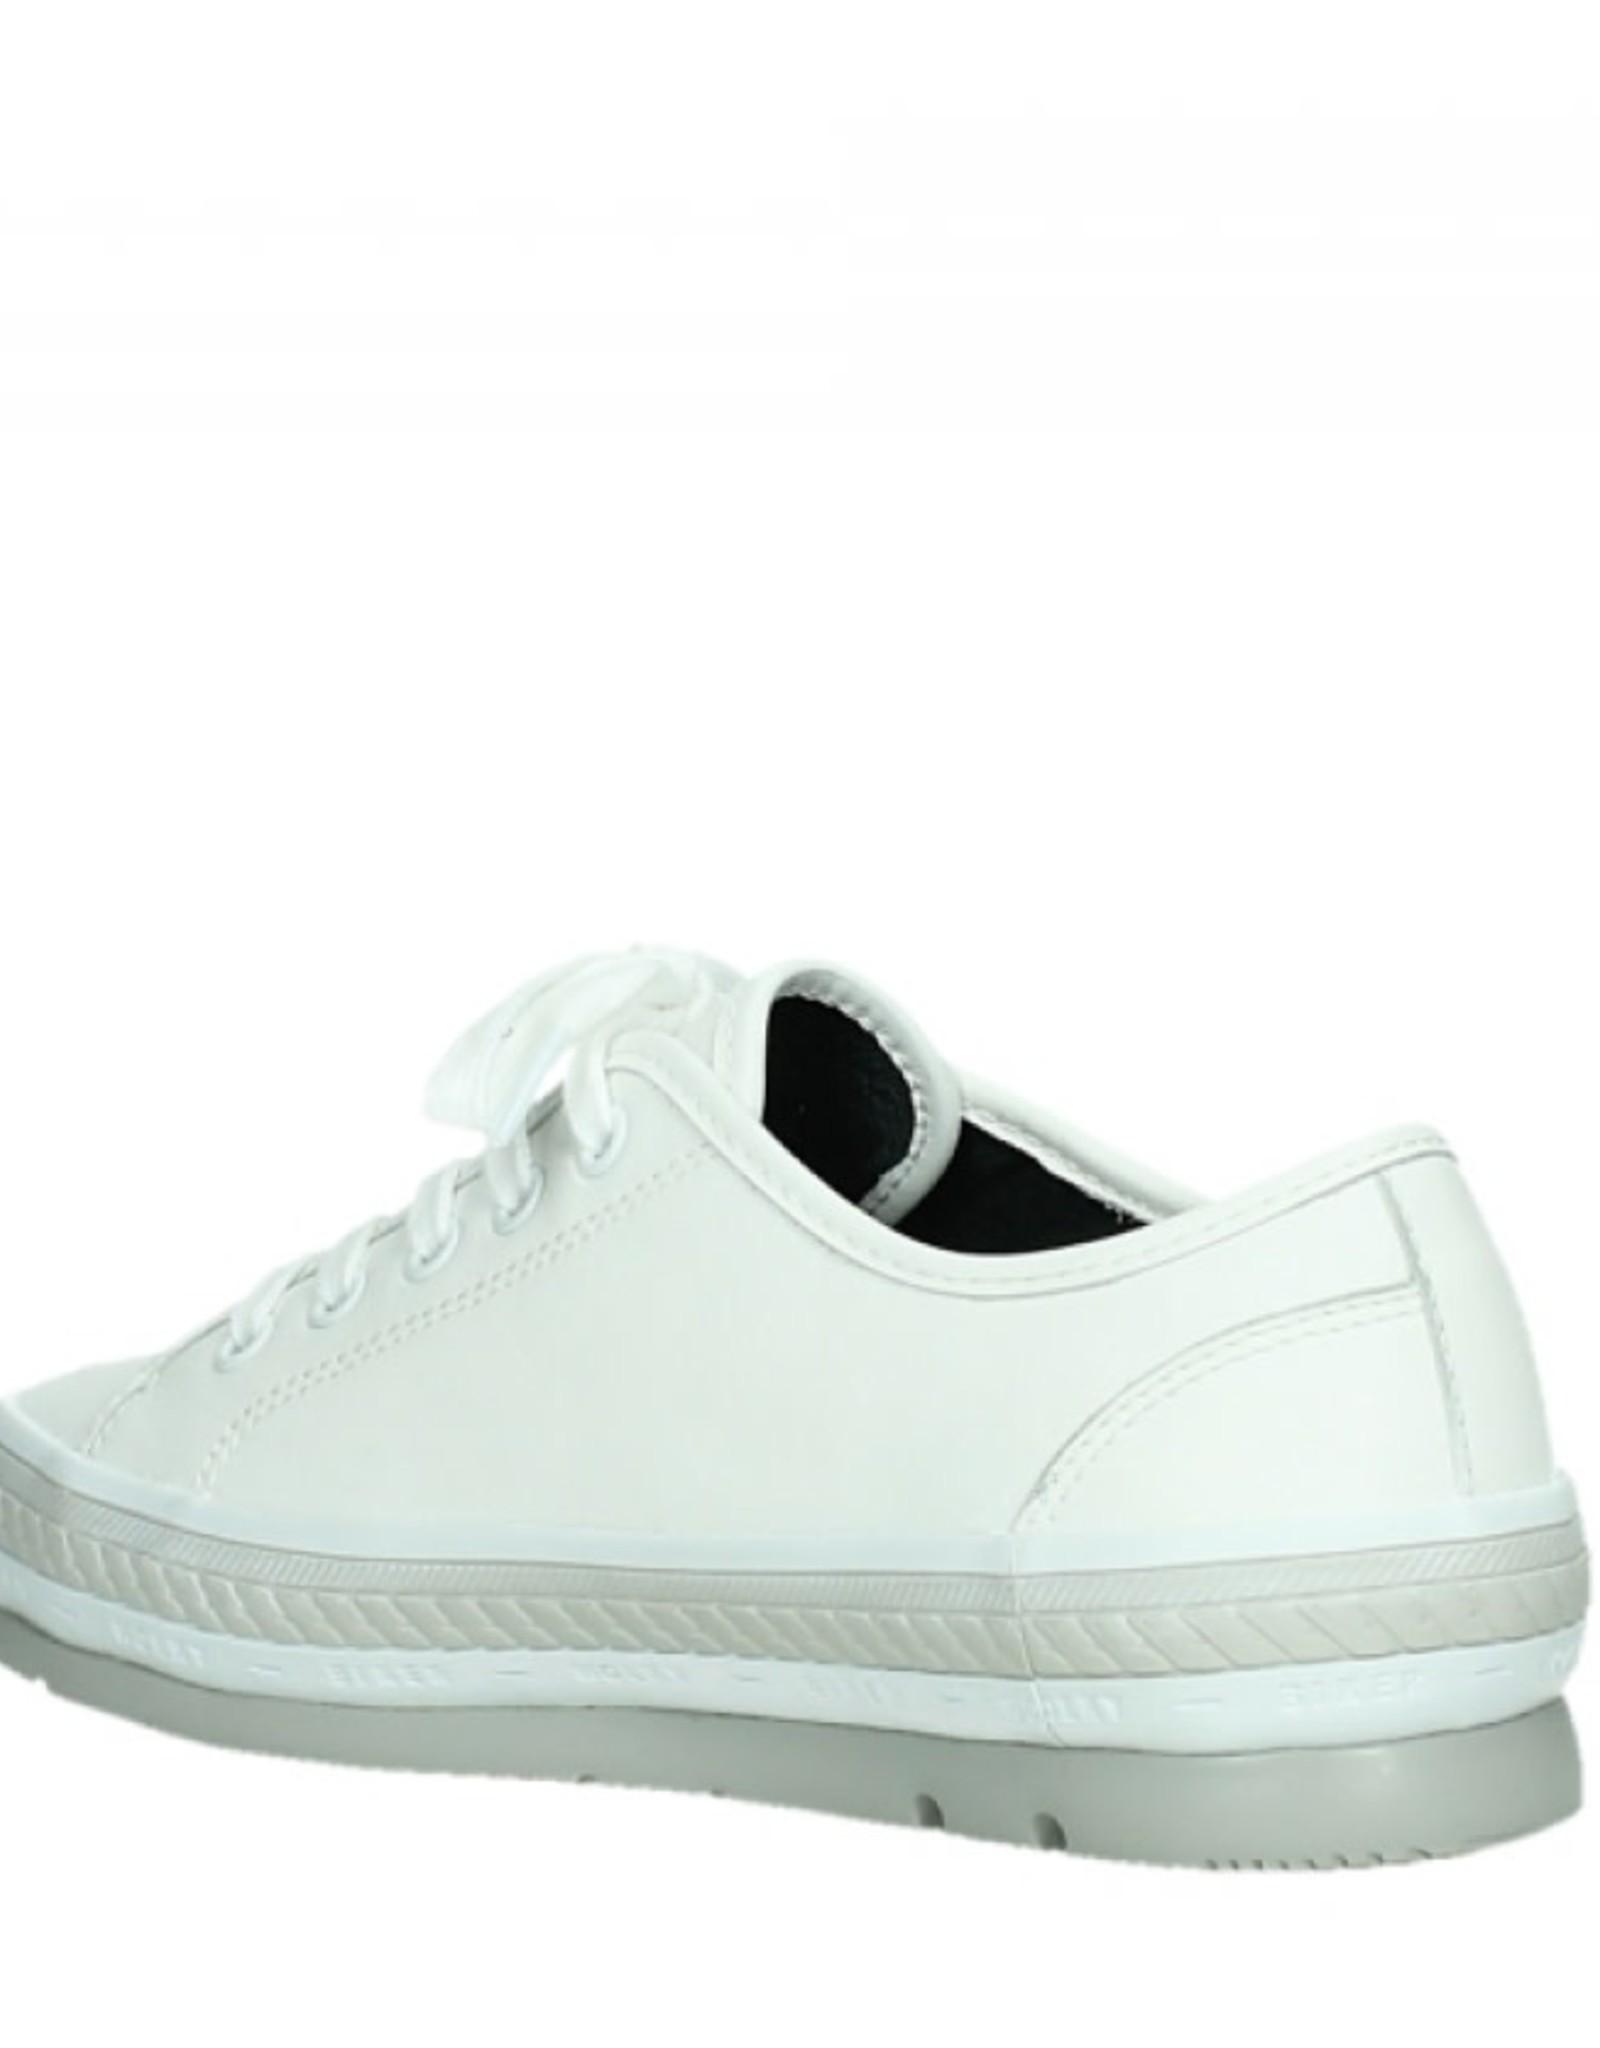 WOLKY Linda Sneaker